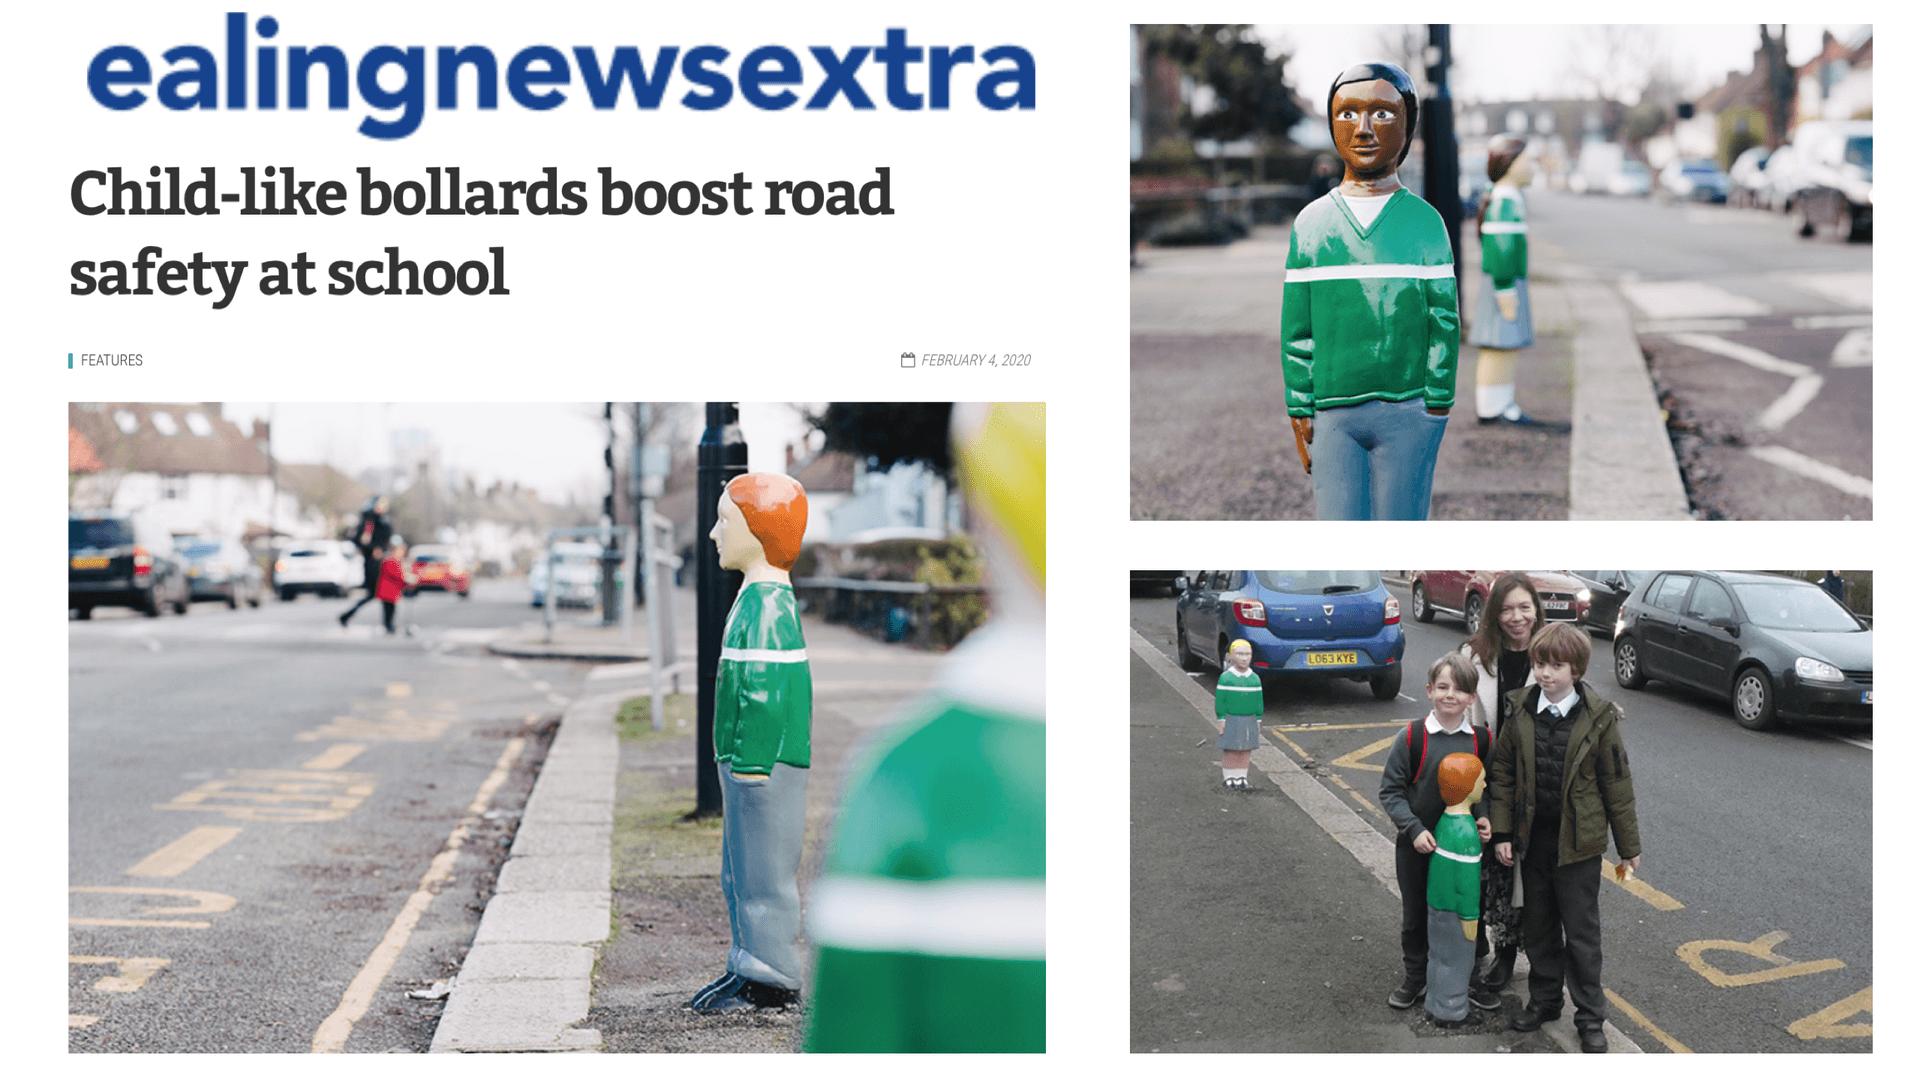 Ealing News Extra - Bollards